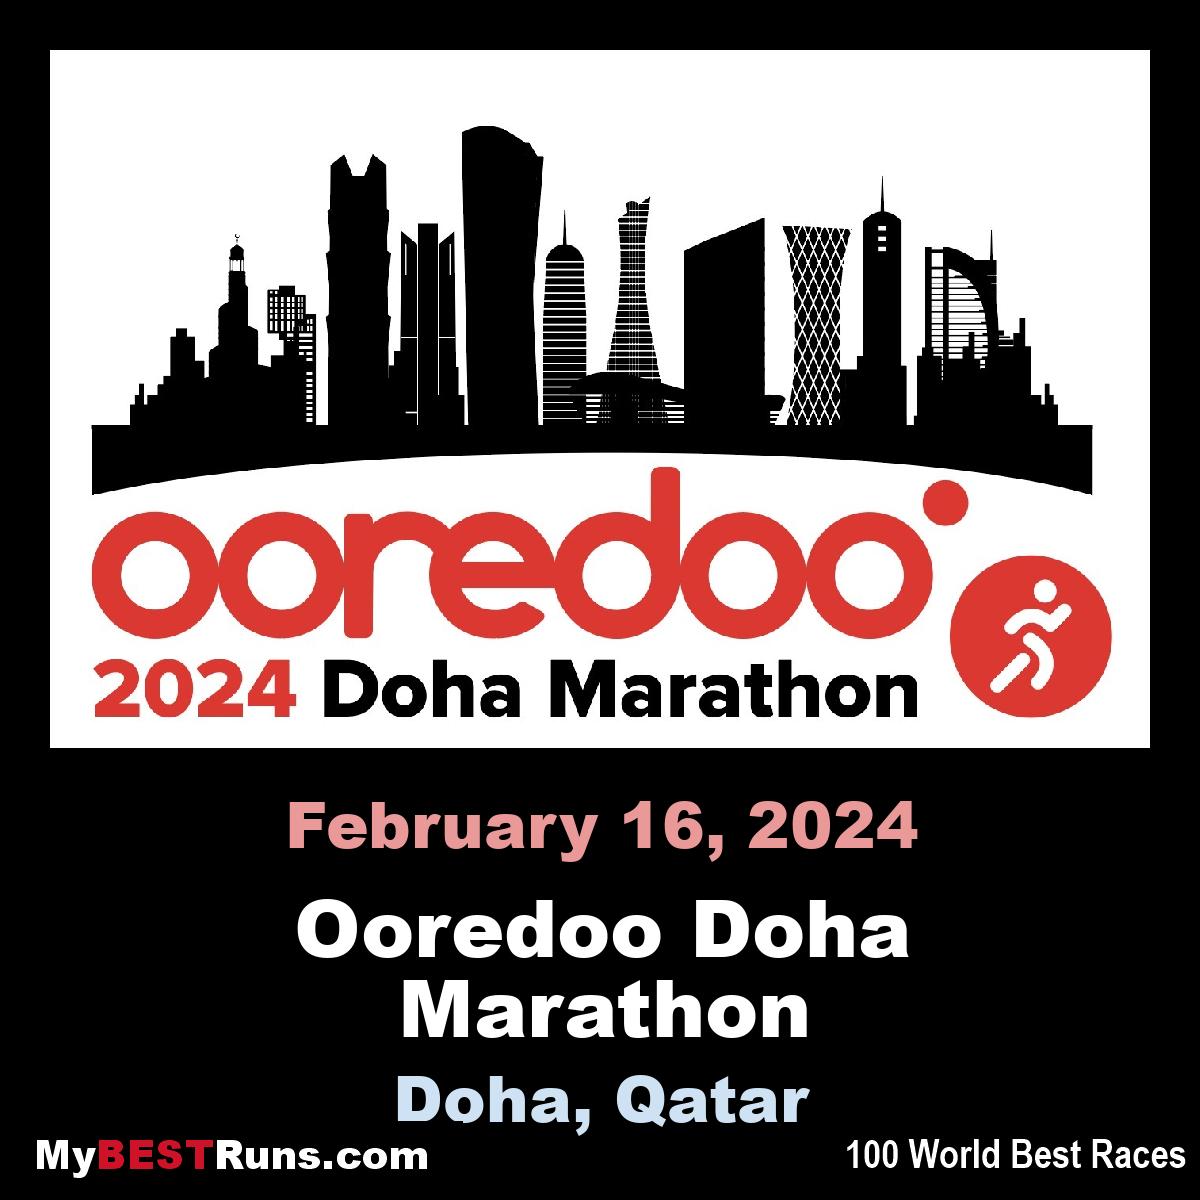 Ooredoo Doha Marathon